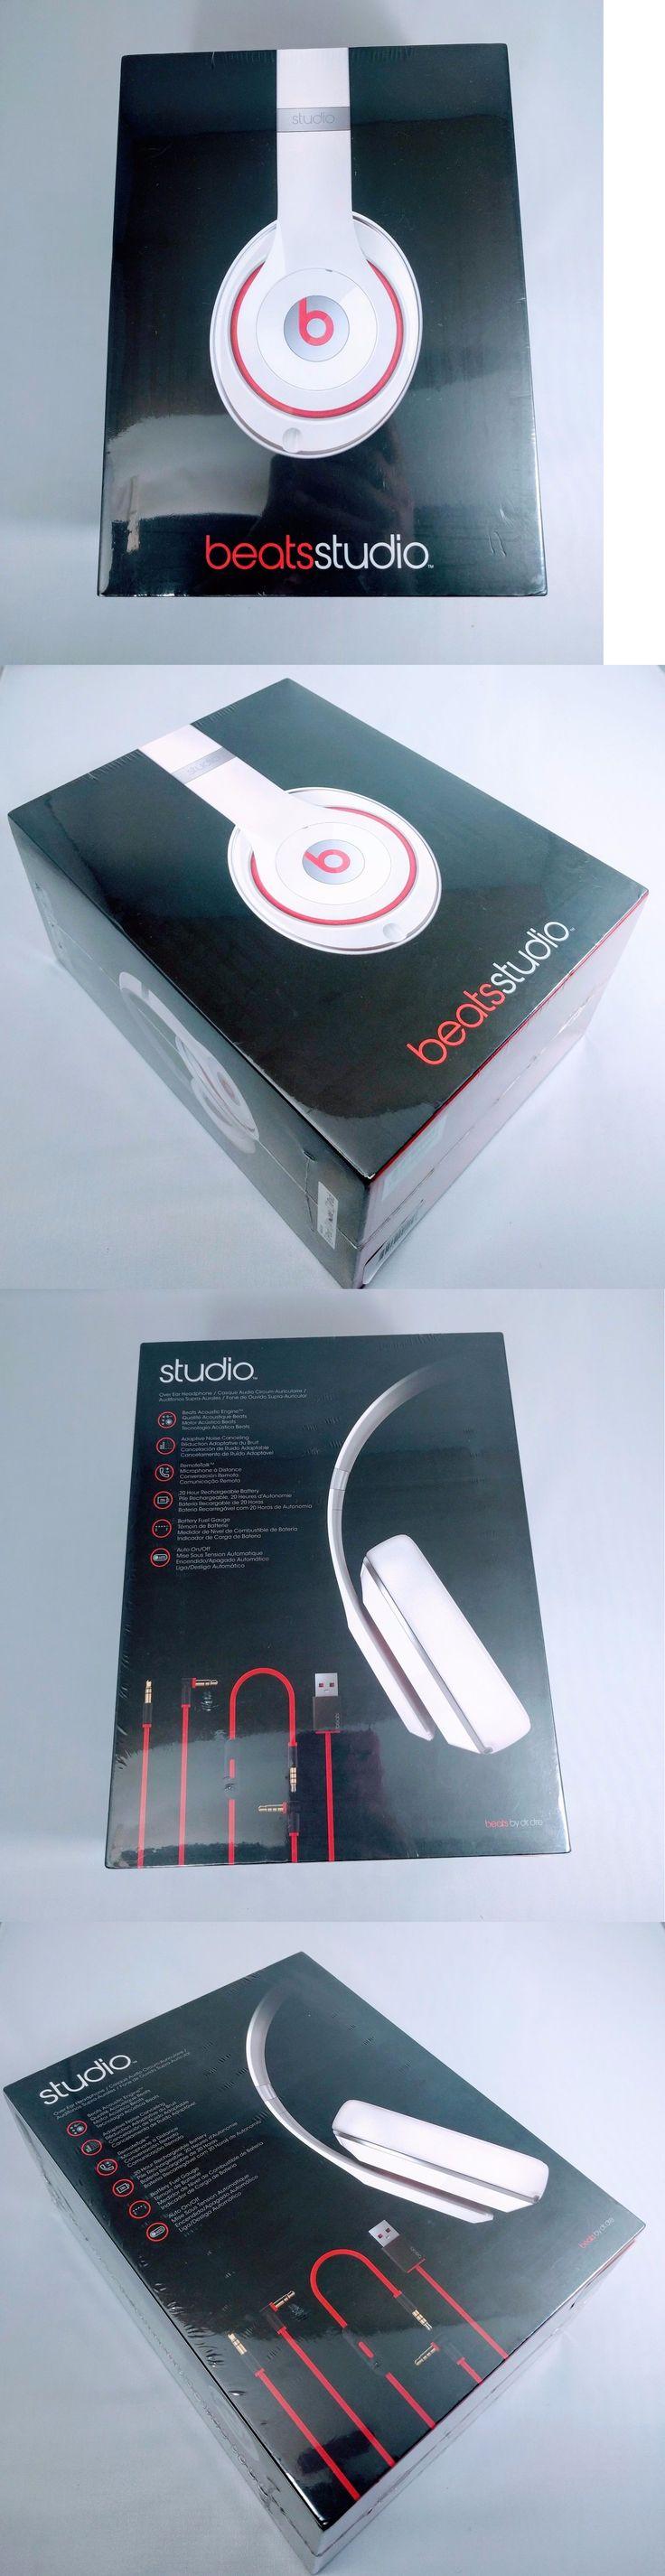 Headphones: New Apple Beats Studio Over-Ear Headphones Mic Noise-Canceling White B0500 Wired -> BUY IT NOW ONLY: $119.88 on eBay!